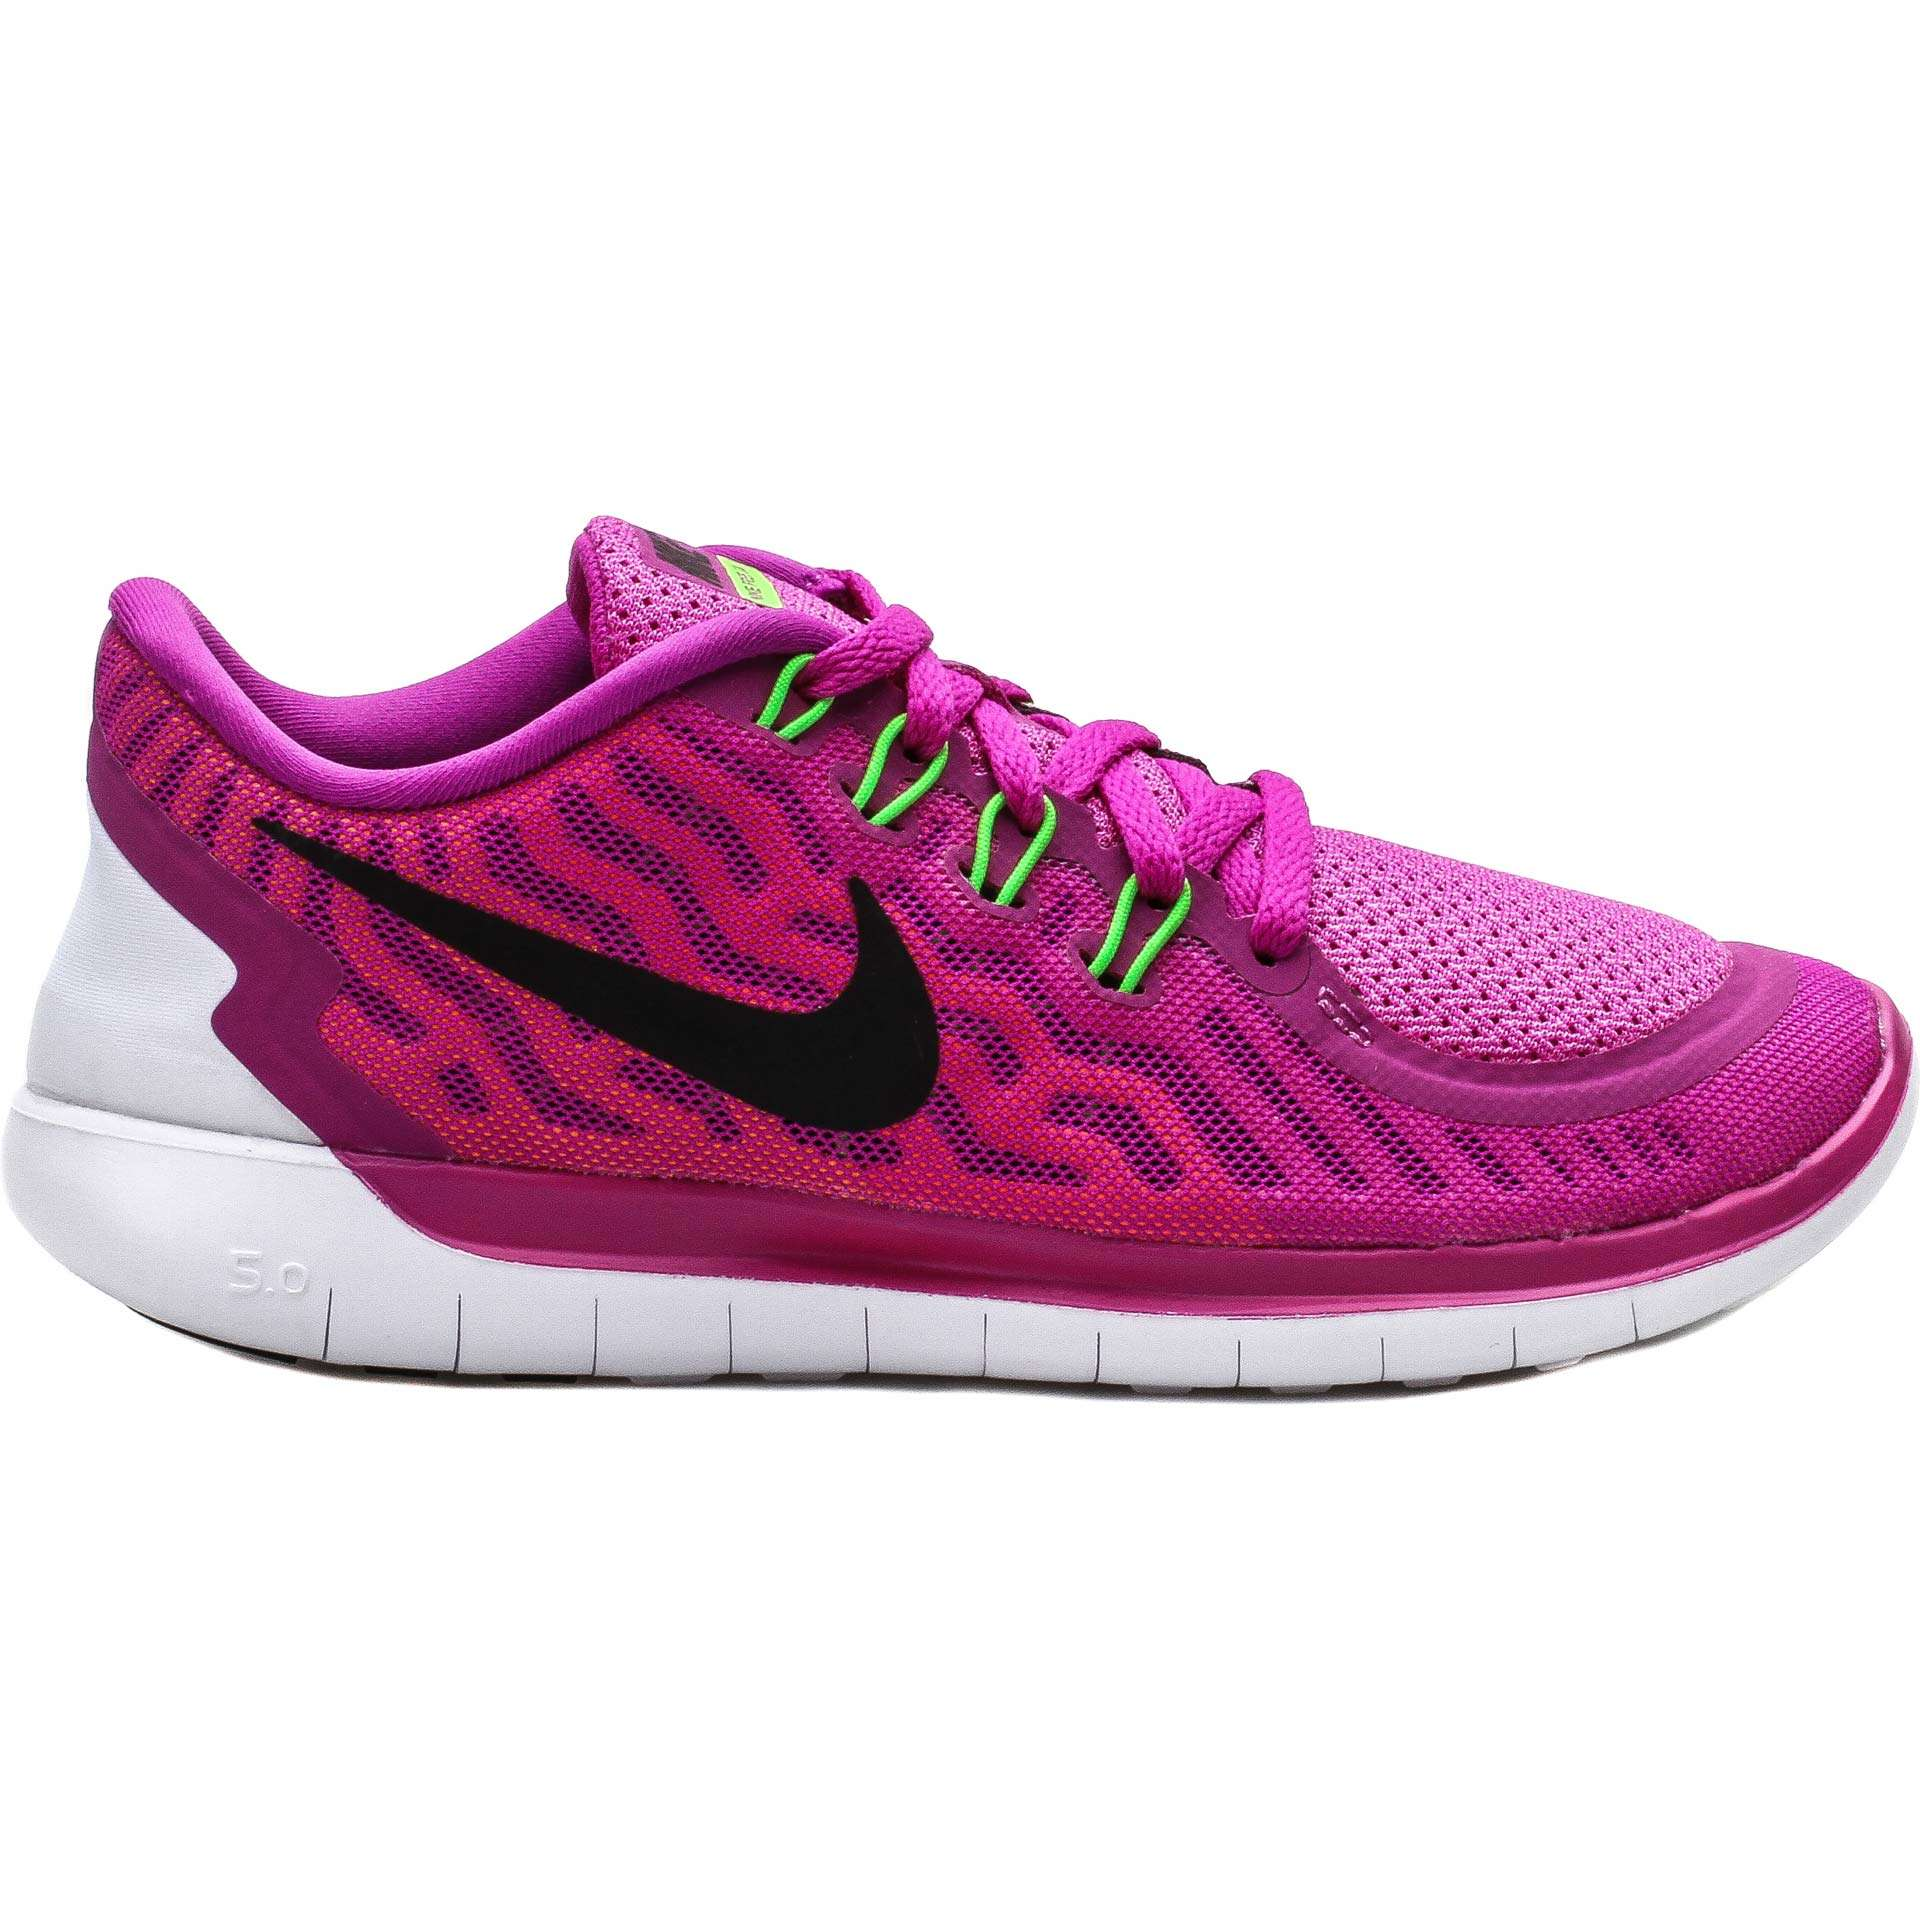 finest selection 8a0be 3d1d0 Nike Free 5.0 Hardloopschoen RozeWit Dames